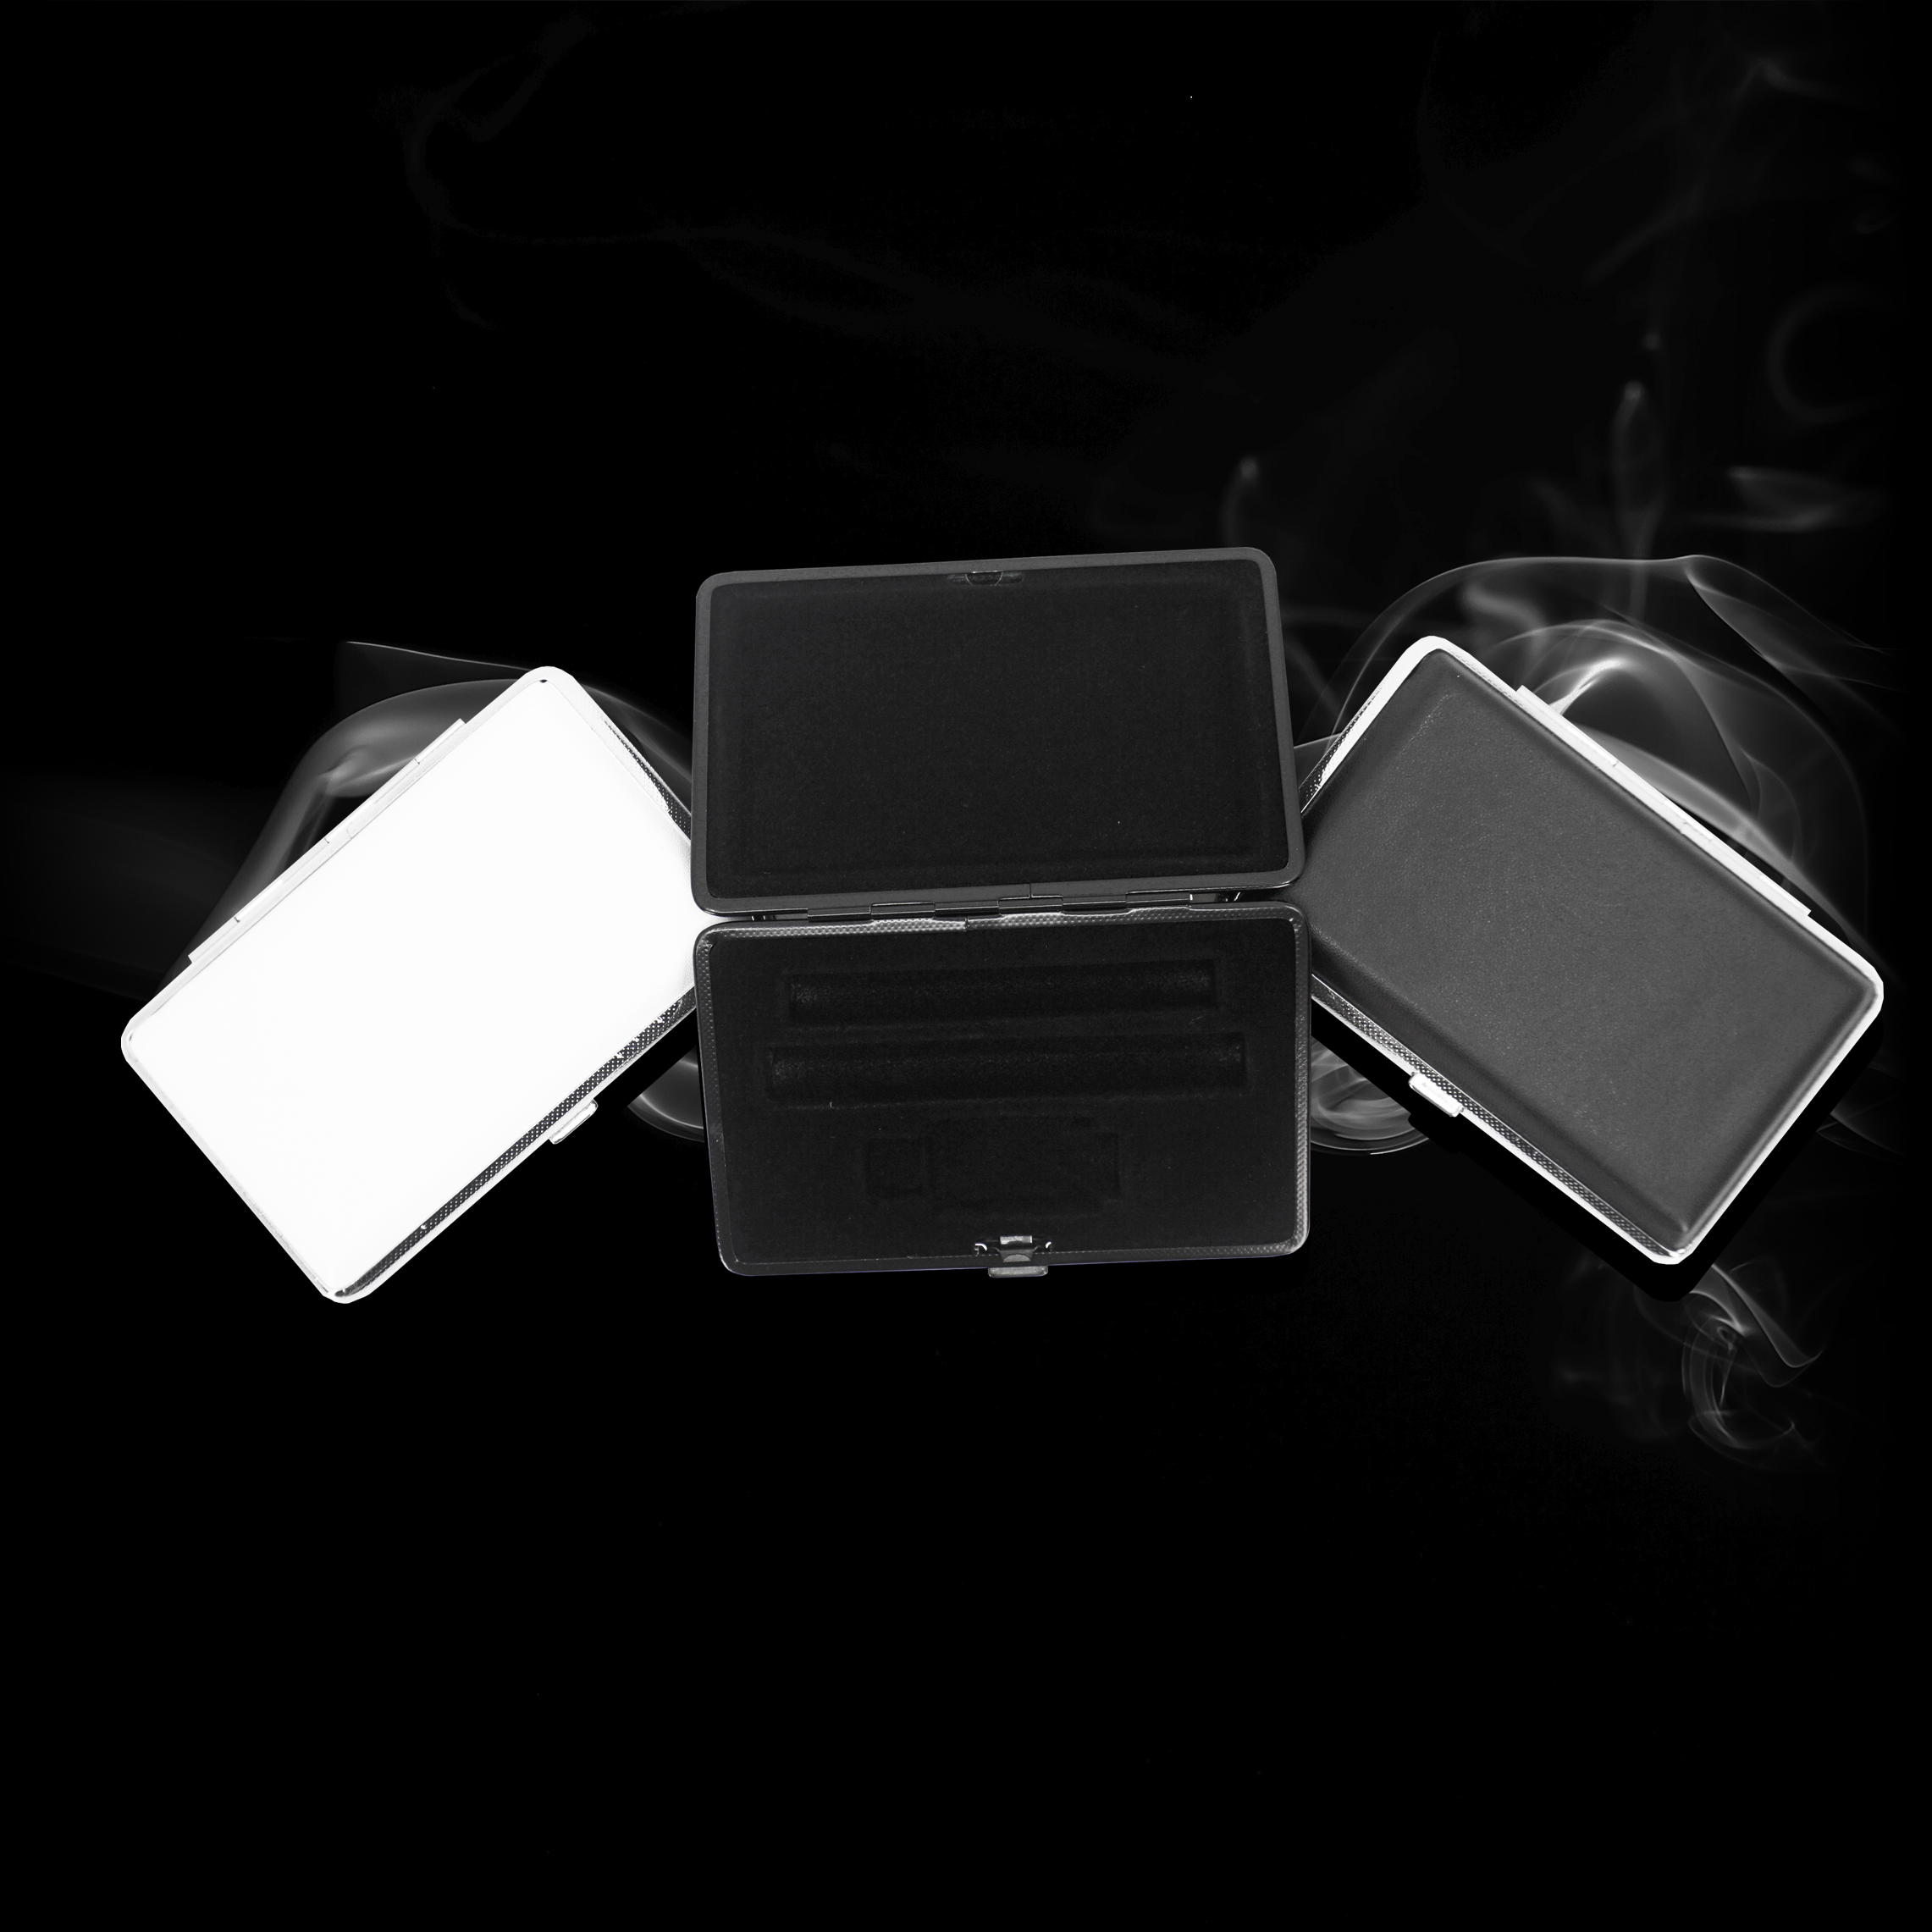 metal cases - features:to fit: cartridges, batteries, usb chargersvelvet interiorsdifferent colors and trims